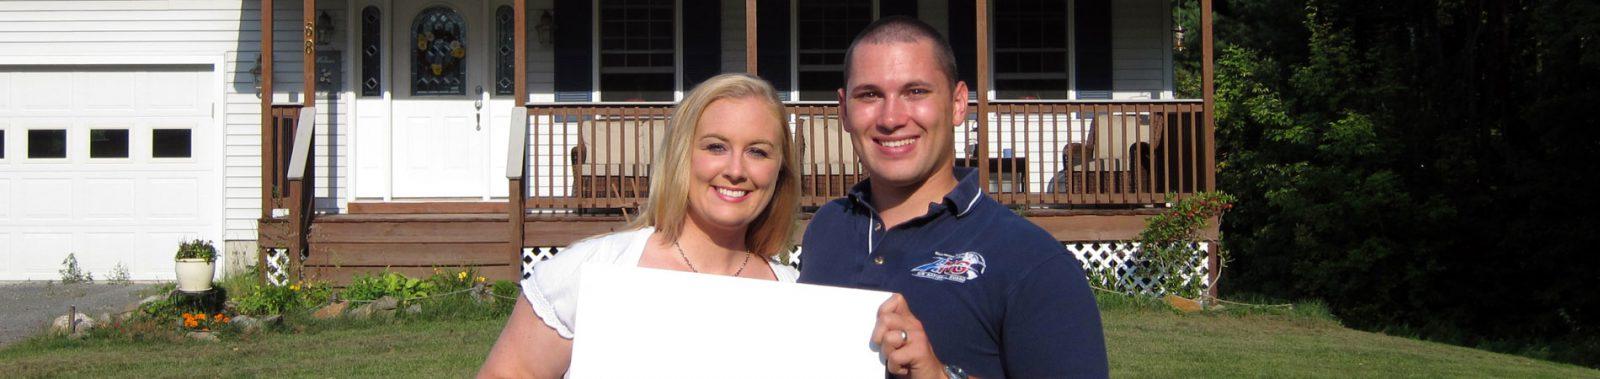 Happy Solar Couple from Dayton